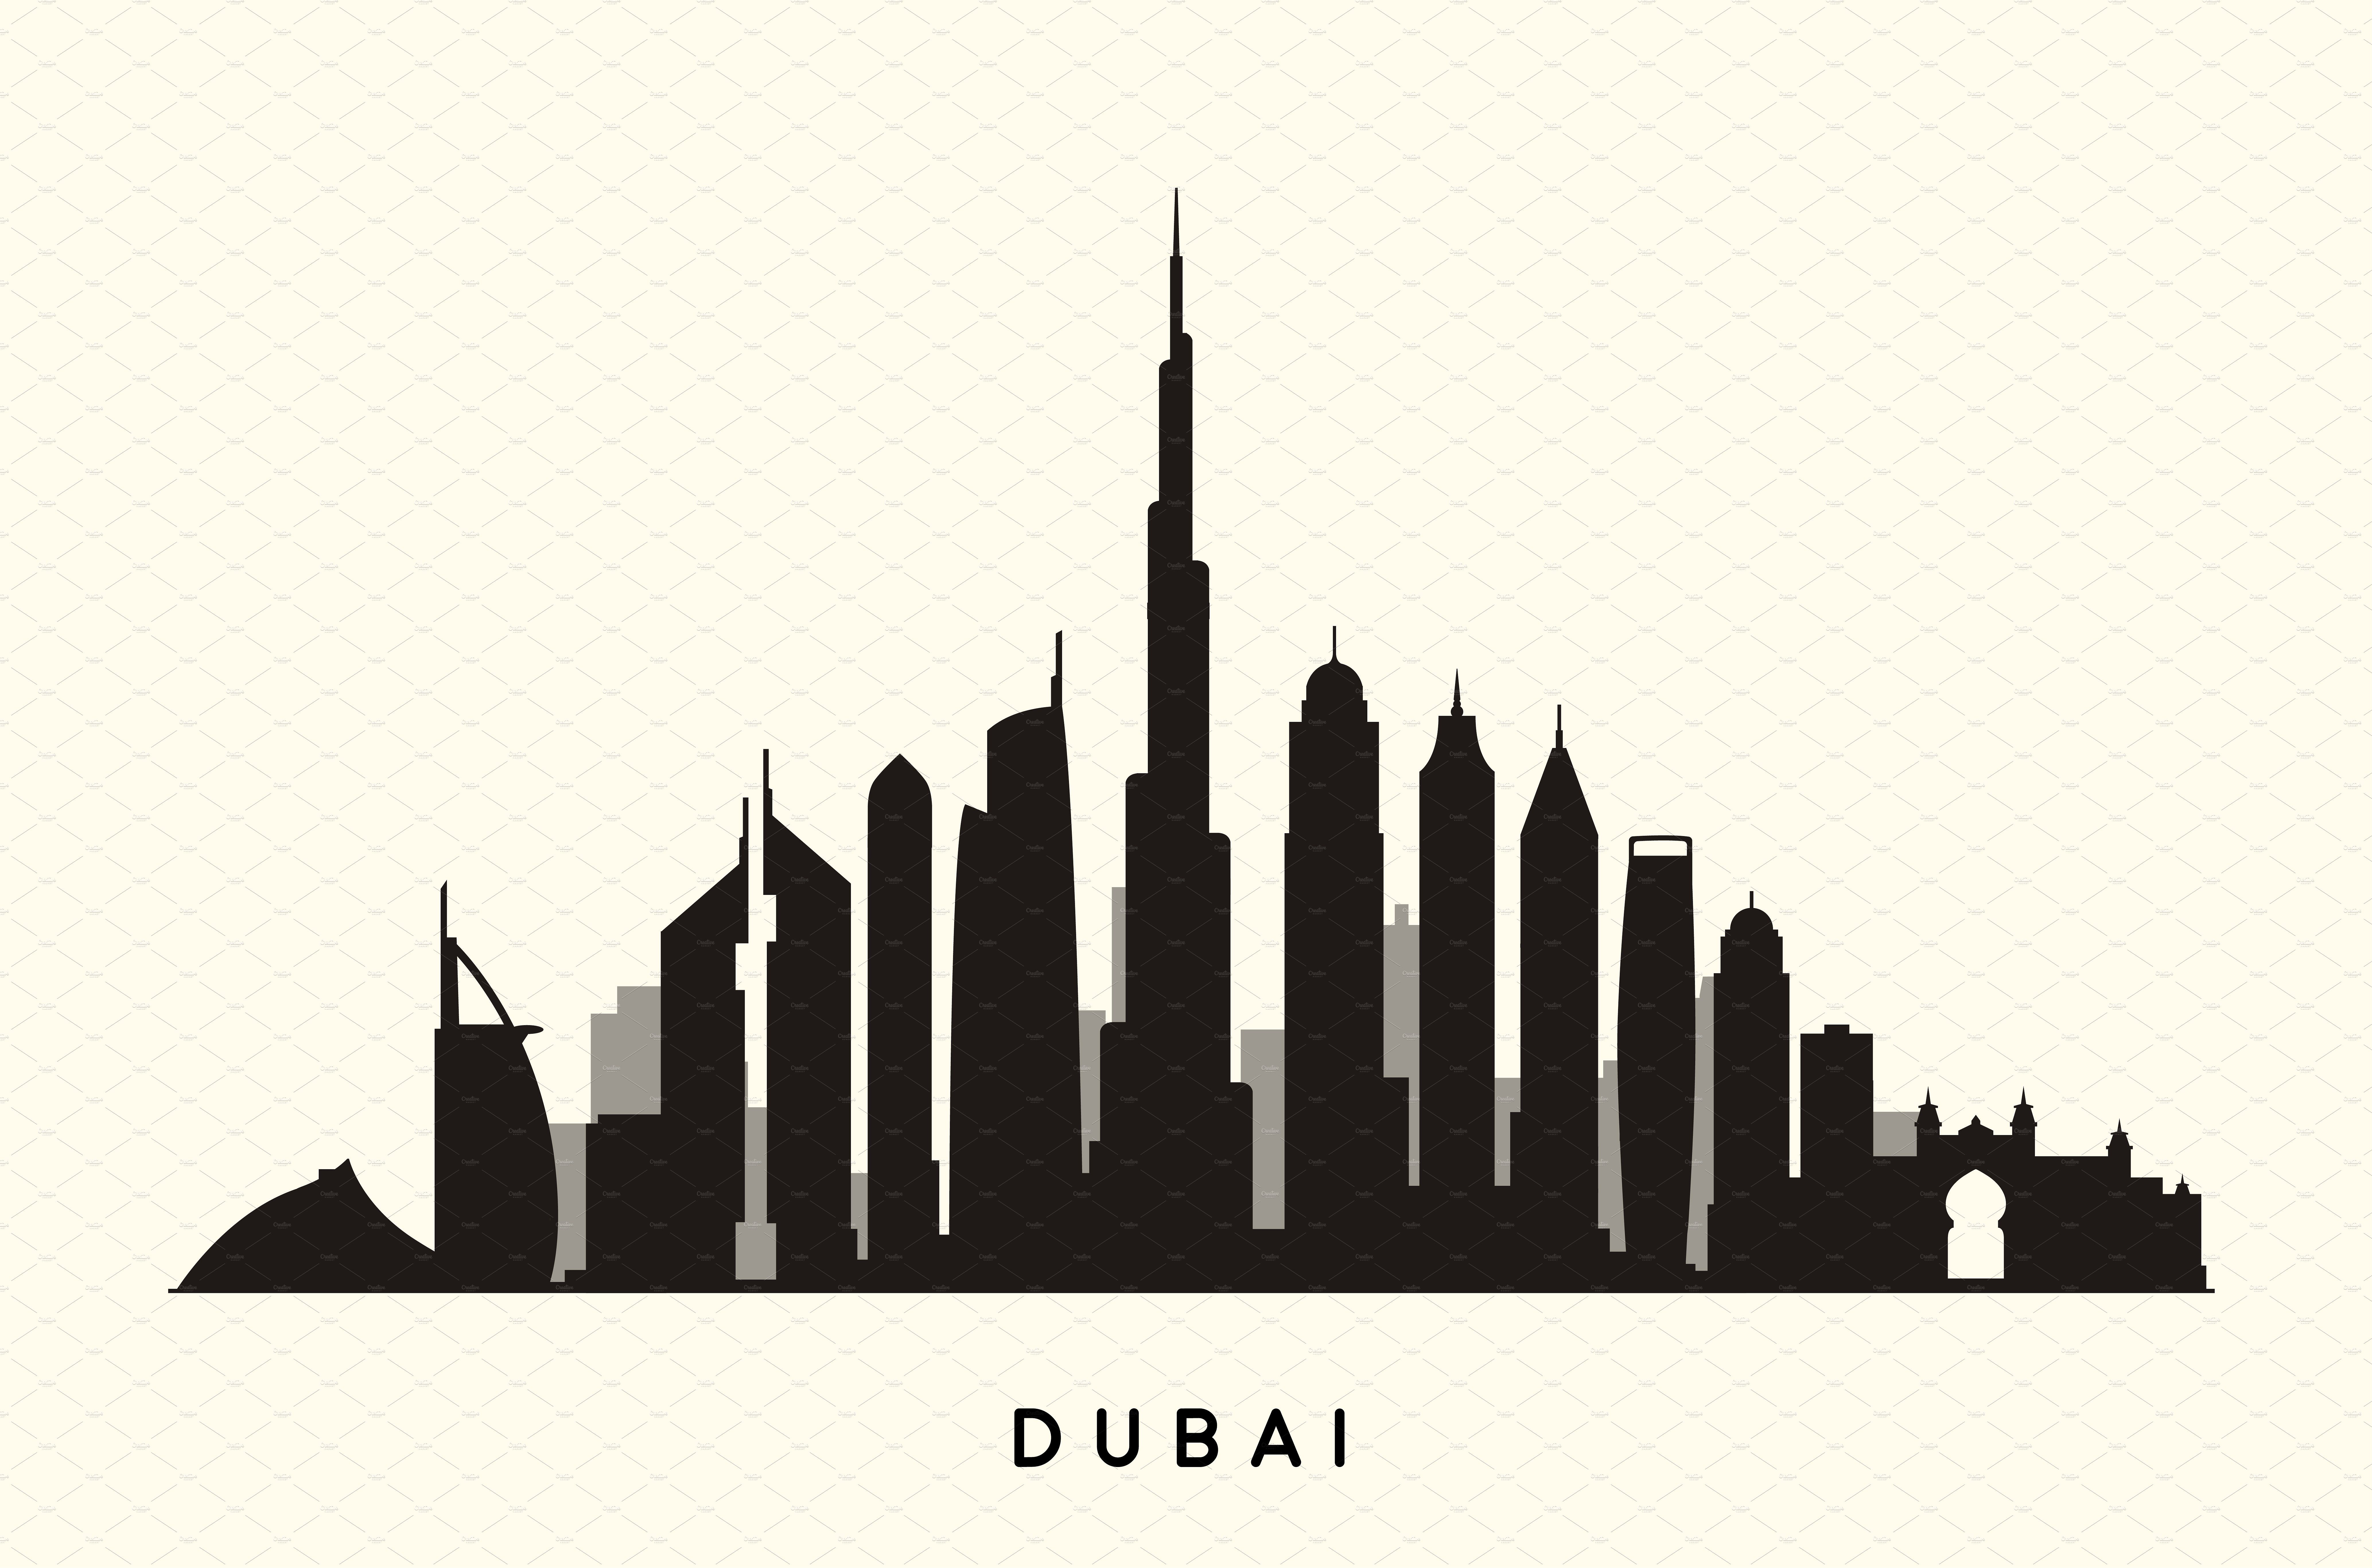 Dubai Abstract Skyline City Illustration Vector Graphics Abstract